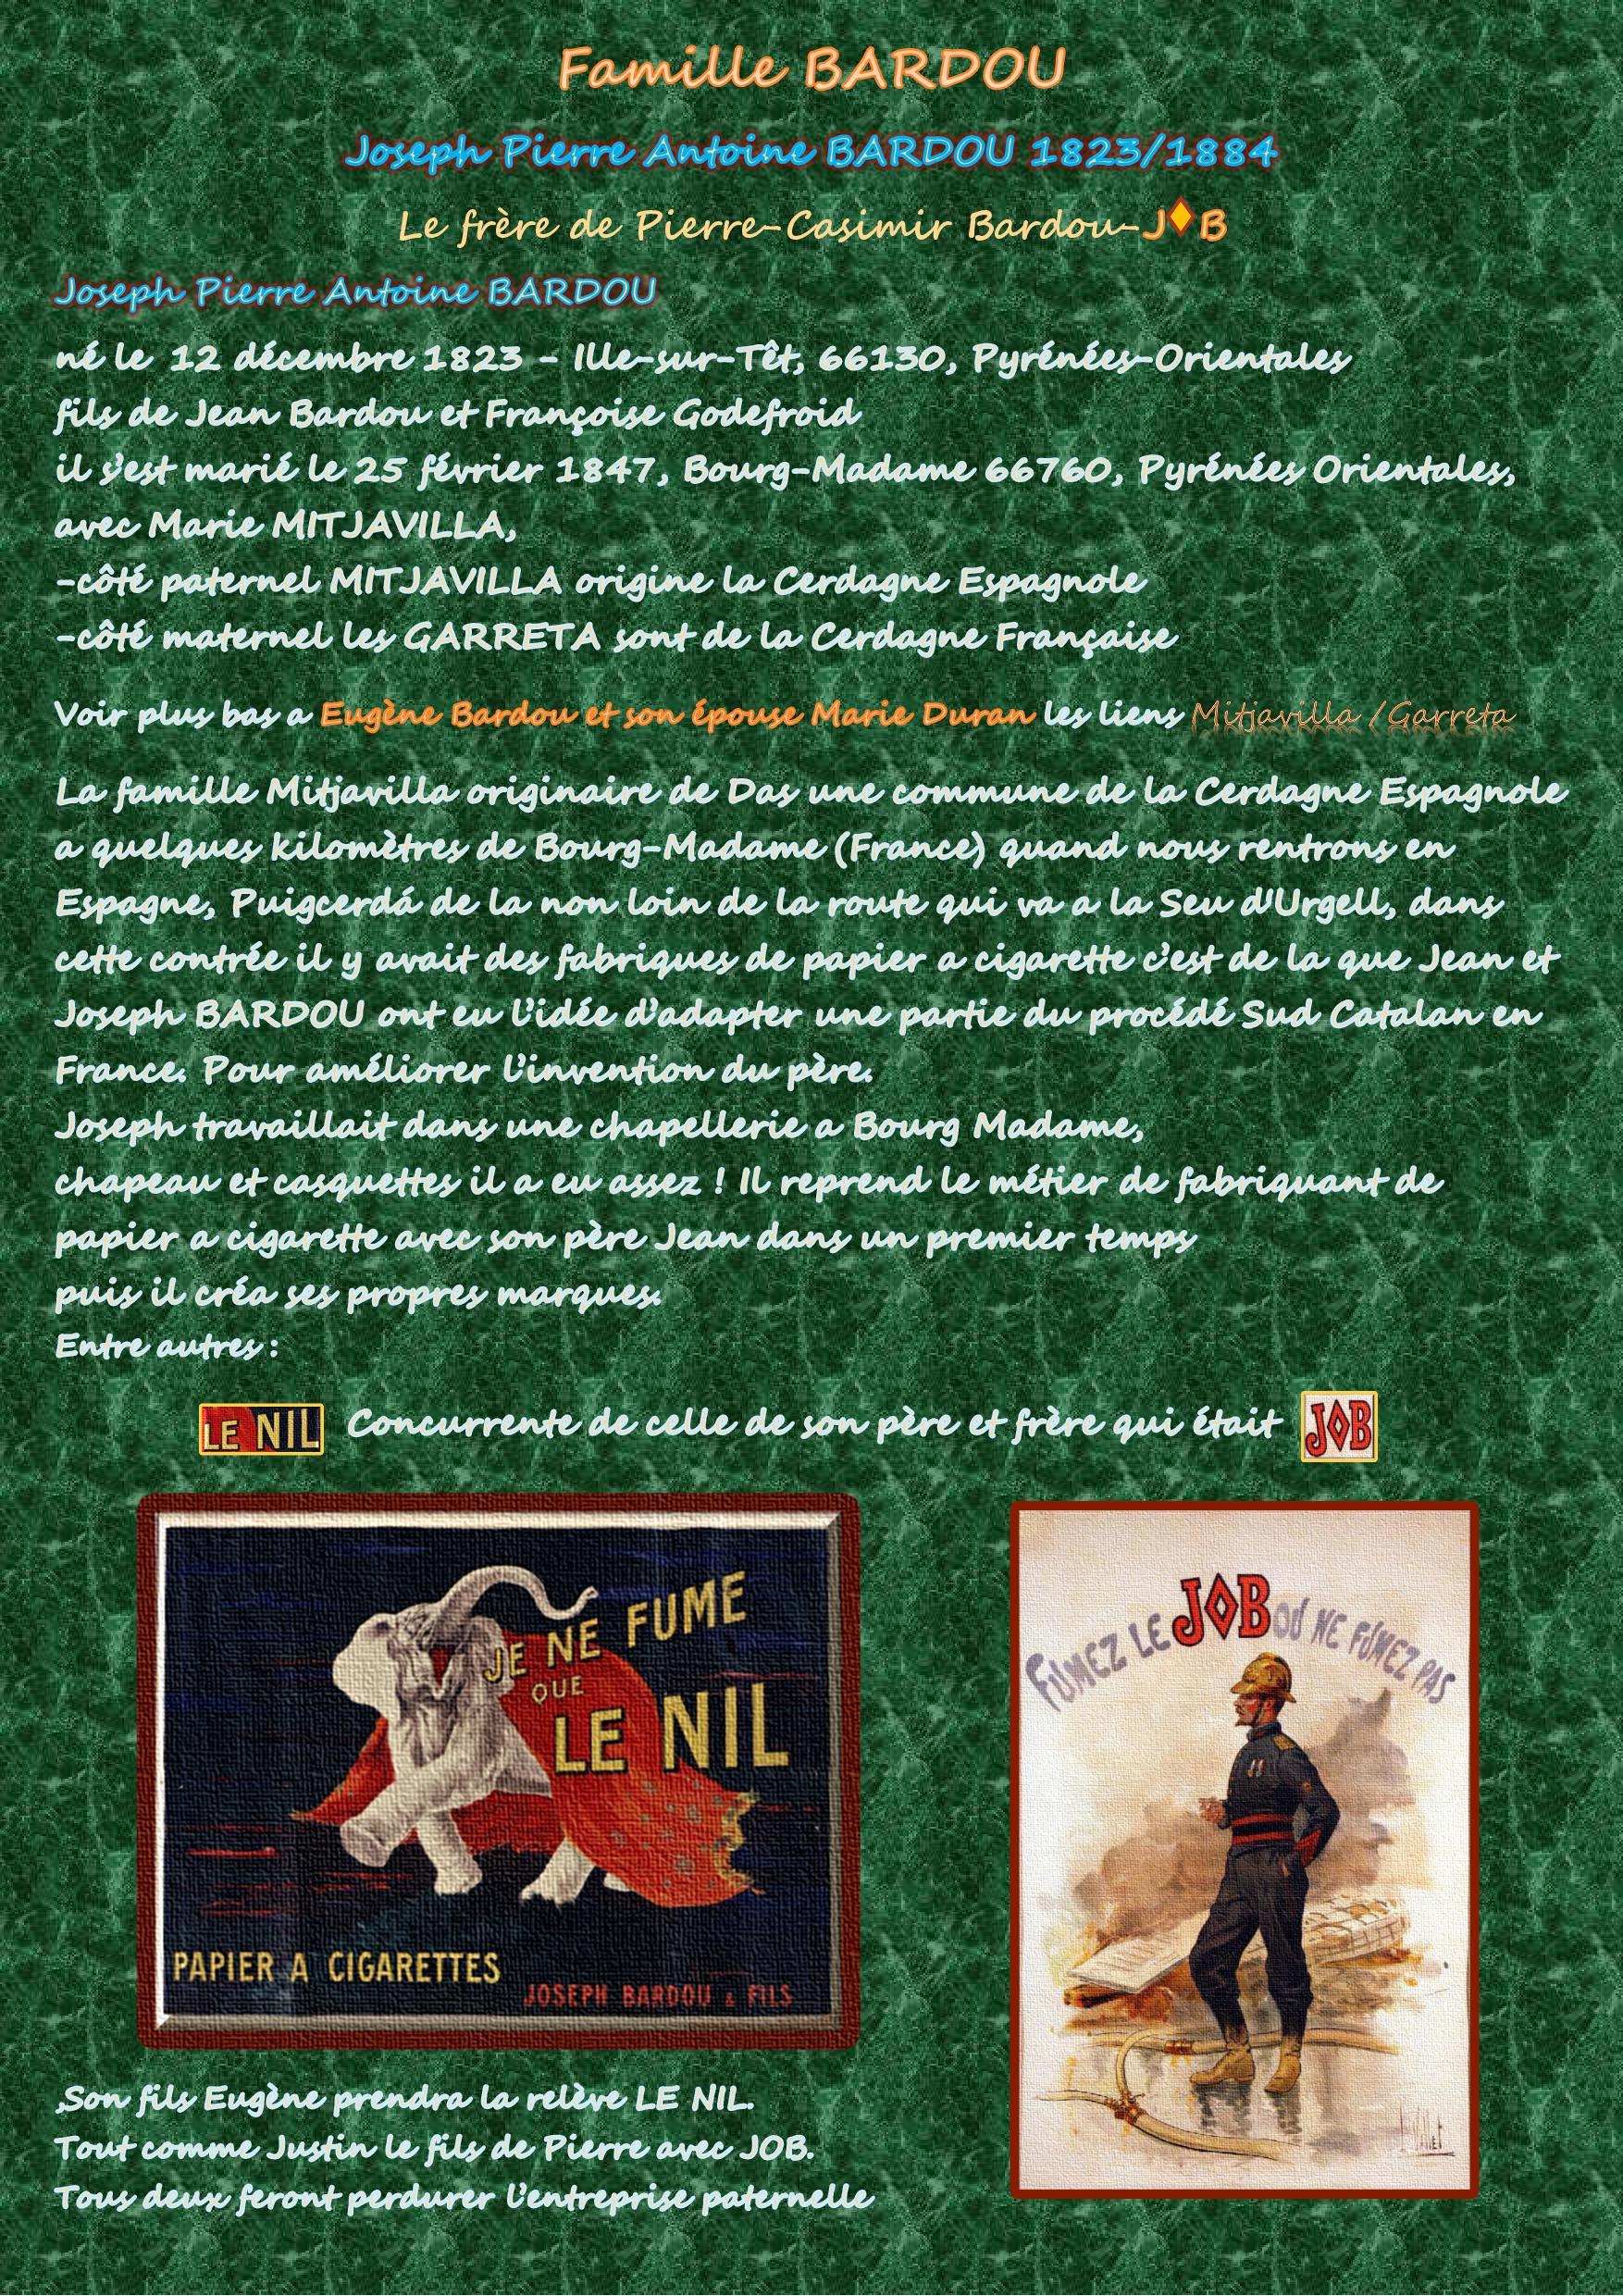 Presentation_mise_a_jour_genealogie_24_Septembre_2016_4.jpg